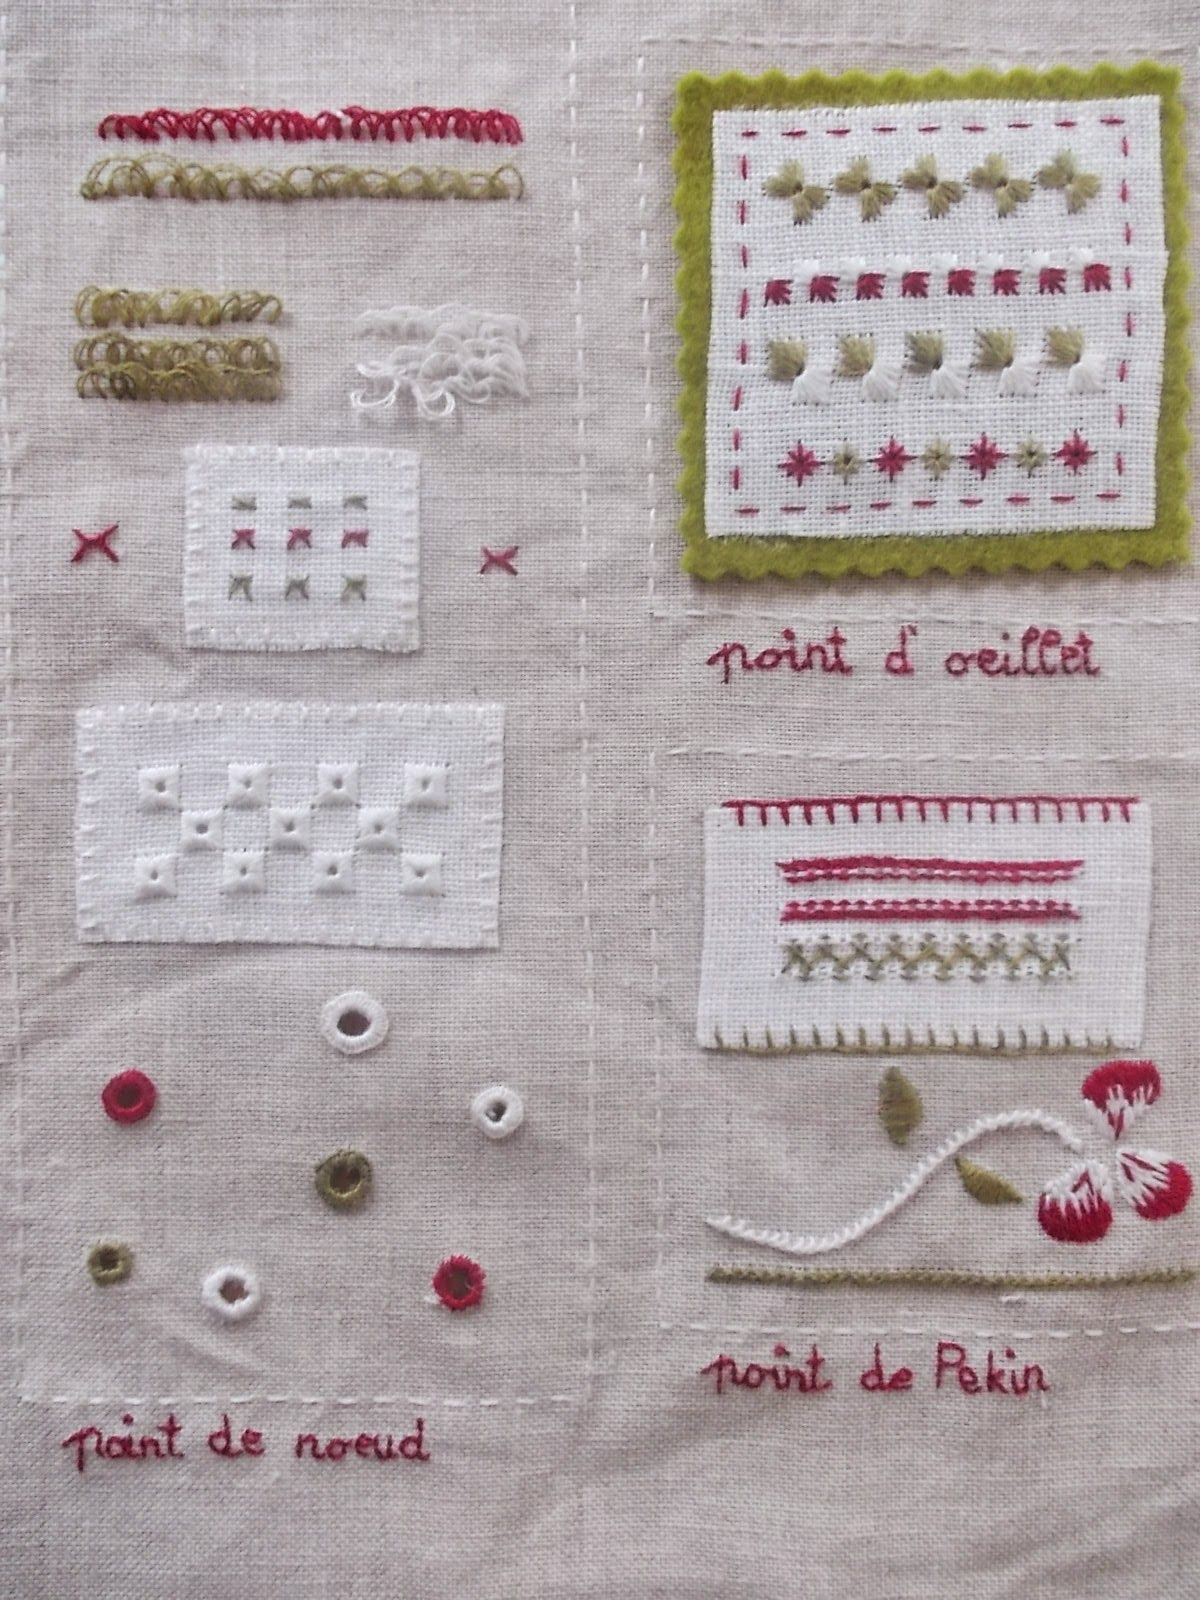 Anjas wunschpunsch stitches pinterest embroidery stitch